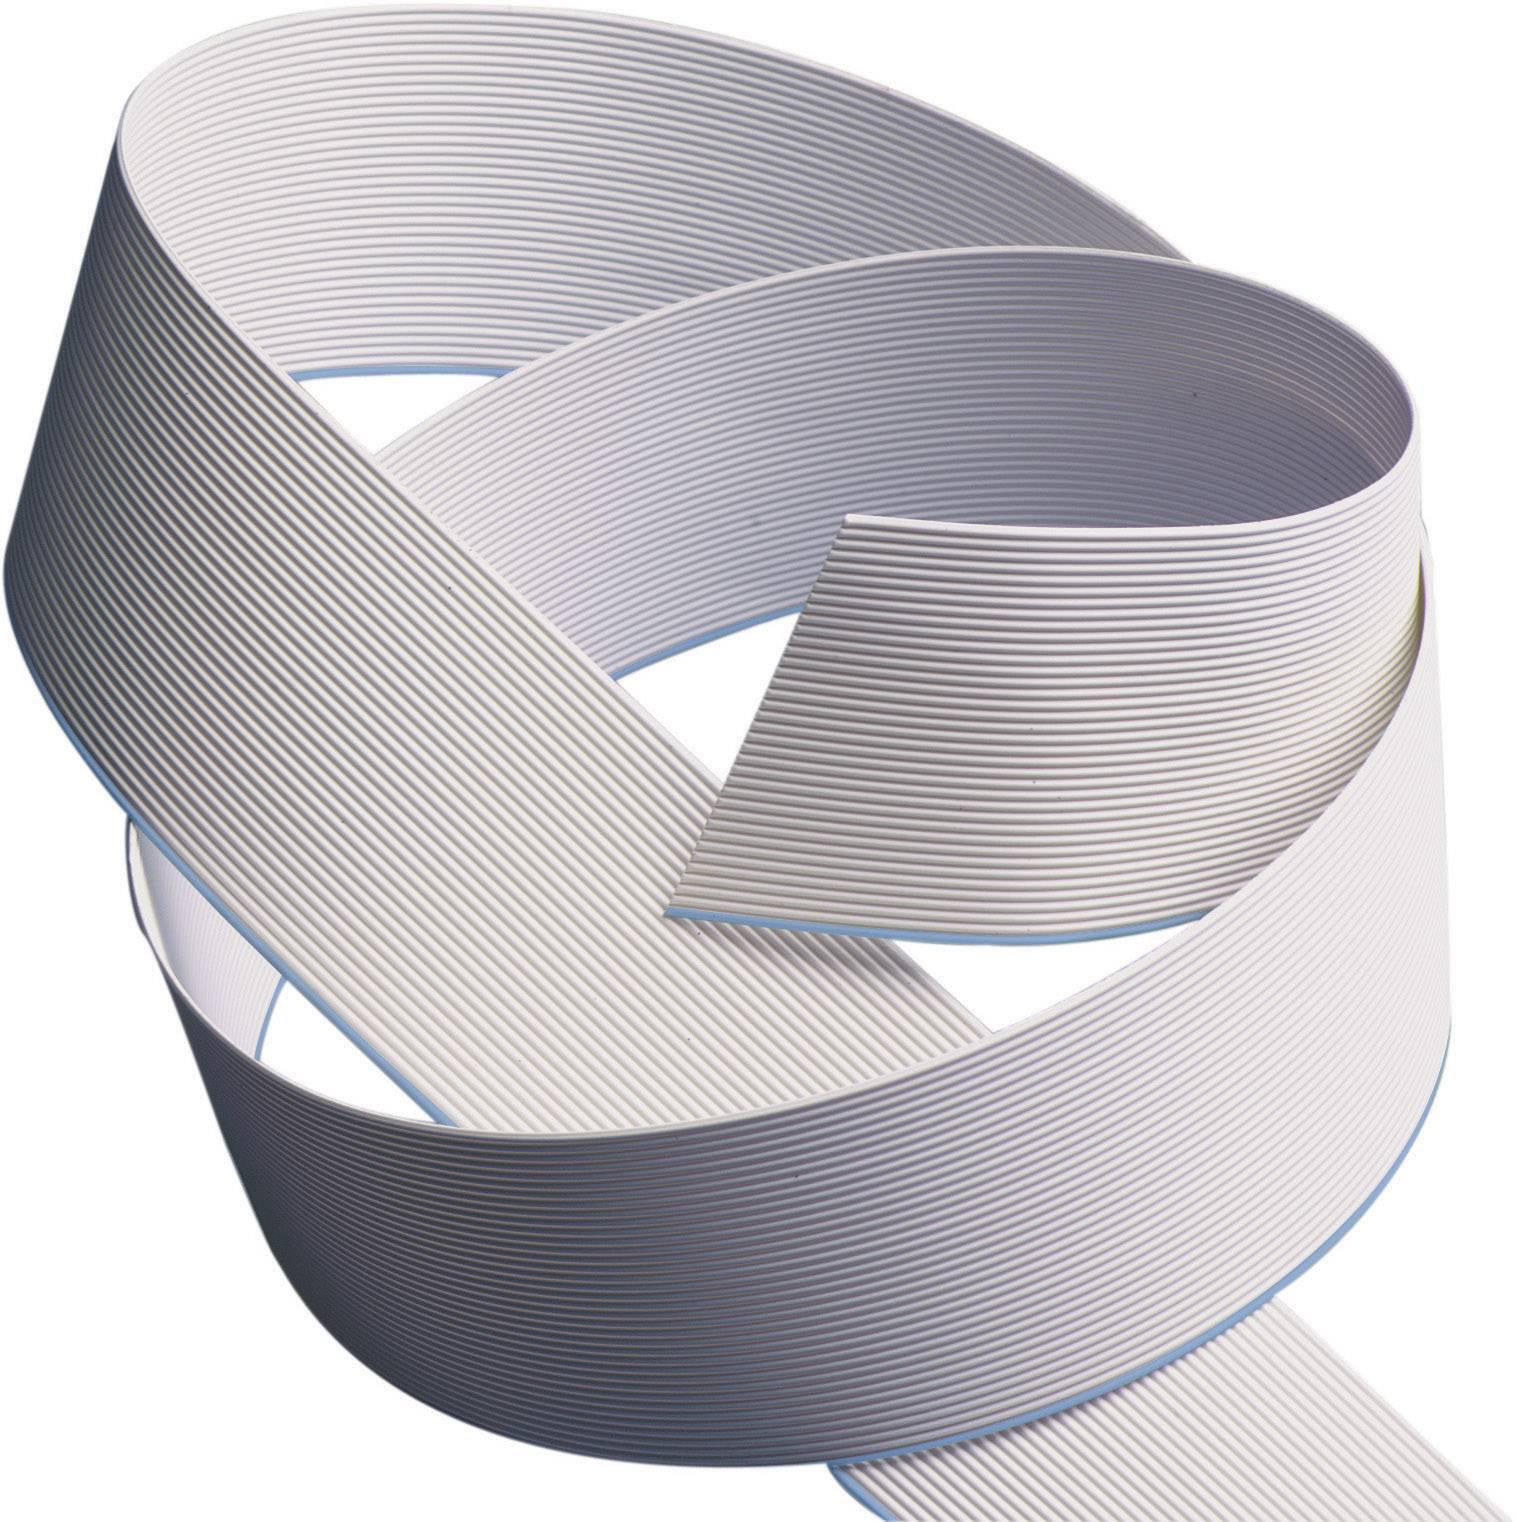 Plochý kábel 3M 7000057361, rozteč 1.27 mm, 16 x 0.08 mm², sivá, metrový tovar